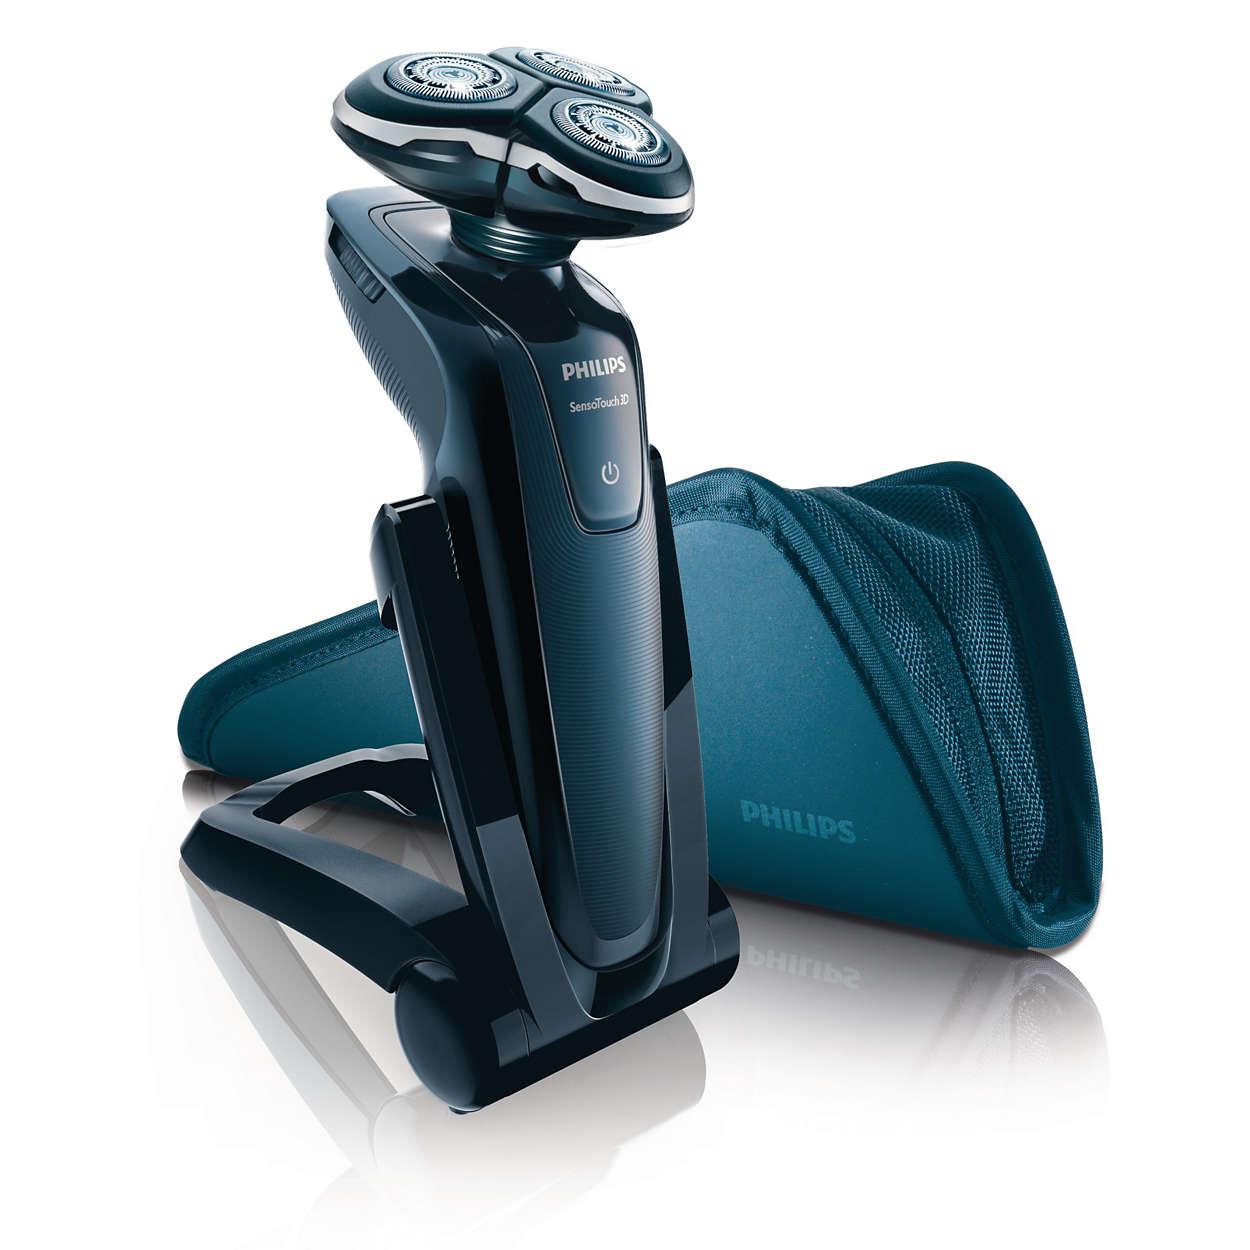 shaver series 9000 sensotouch rasoir lectrique 100 tanche rq1250 17 philips. Black Bedroom Furniture Sets. Home Design Ideas